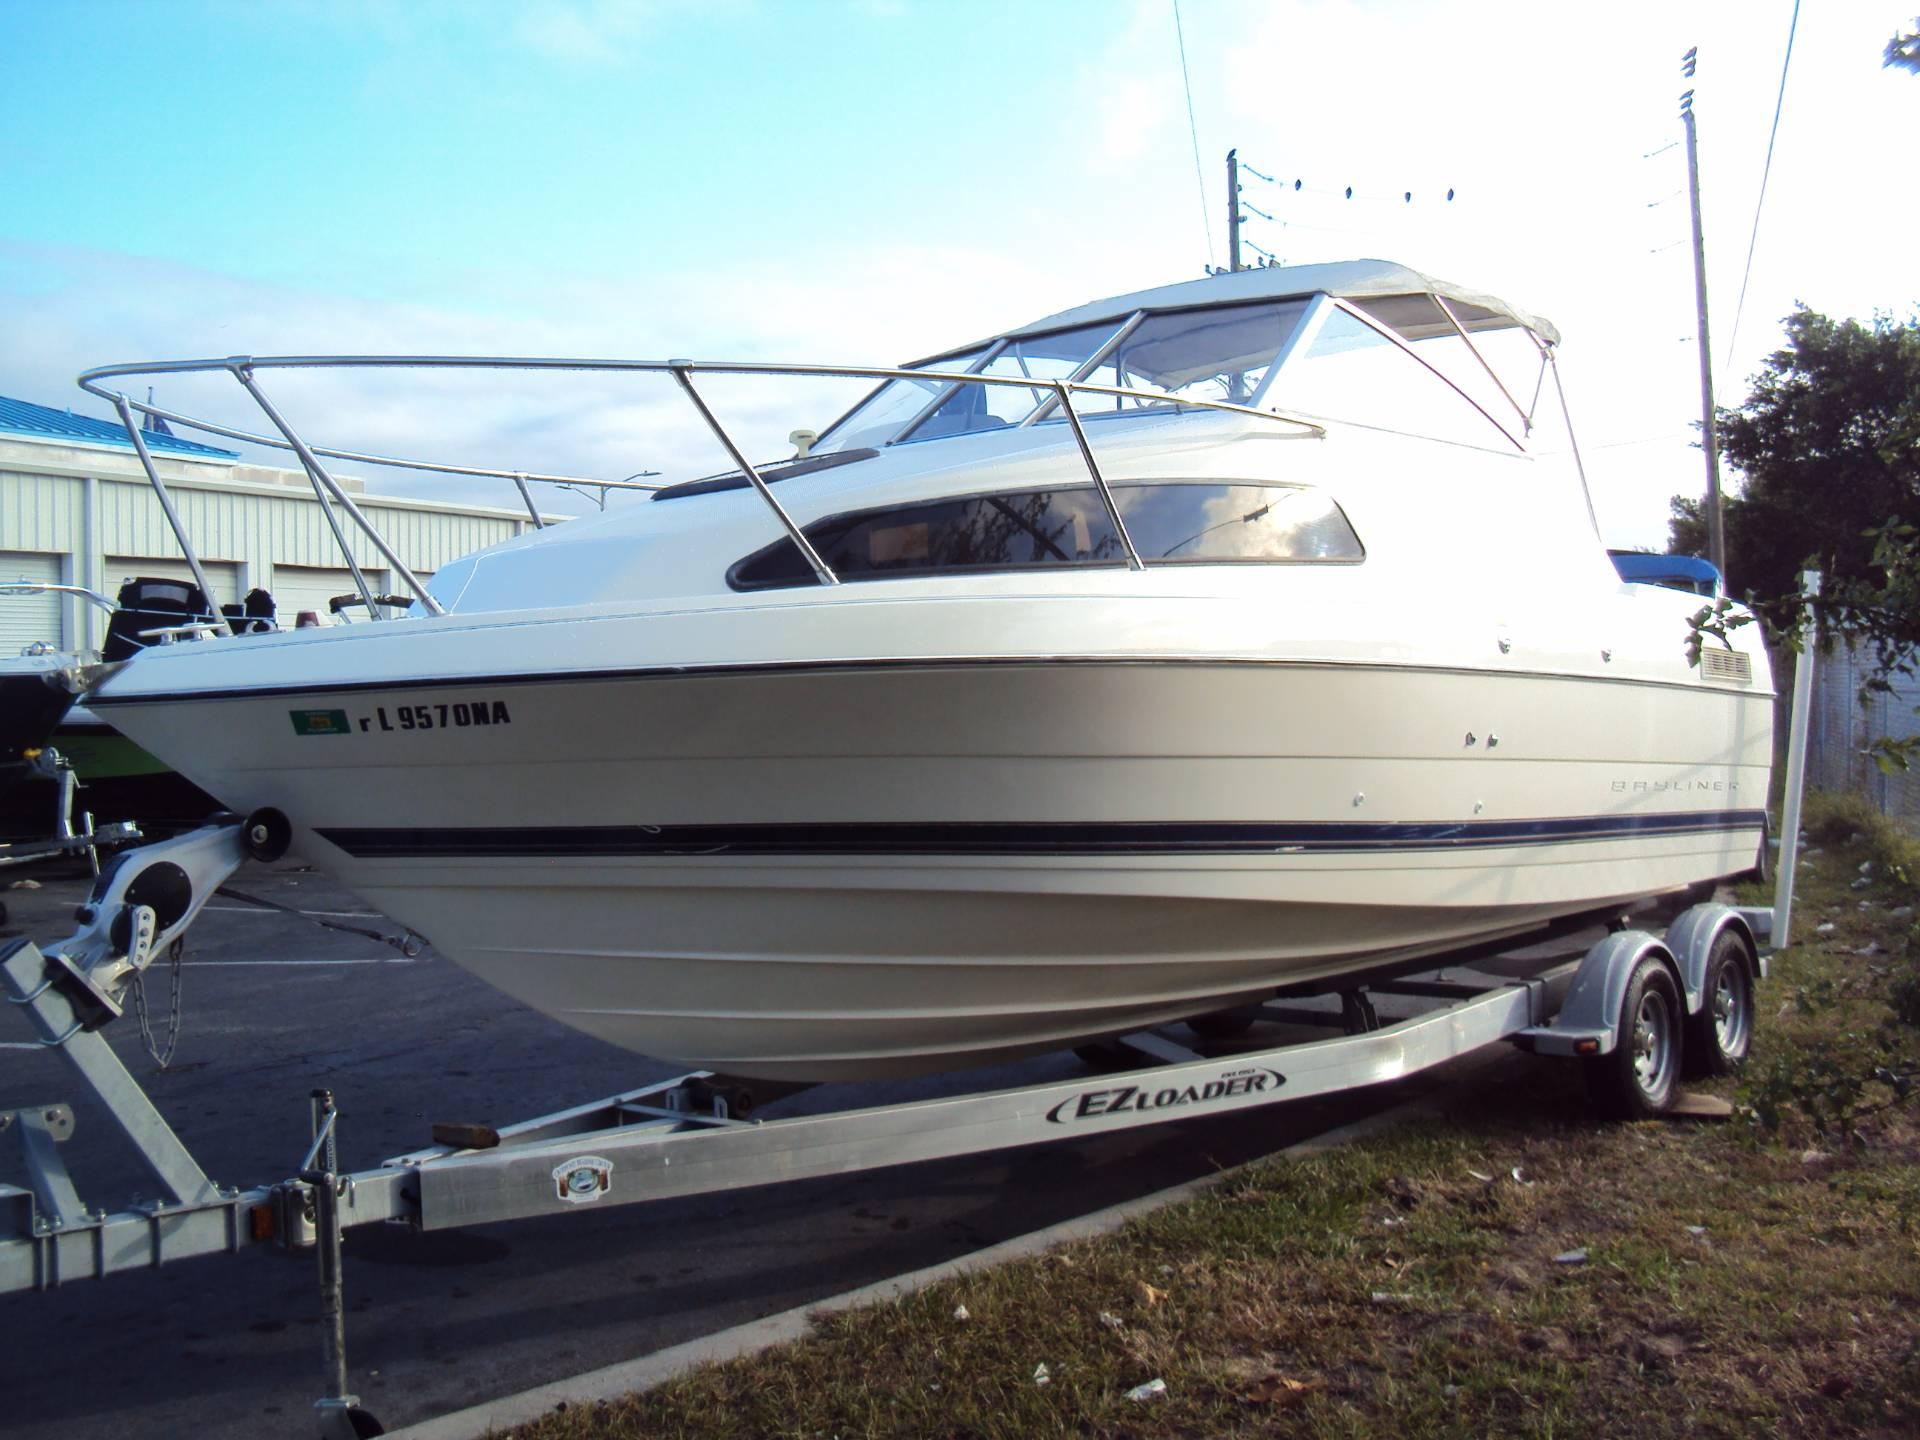 lake the brokerage yacht rogue dsc boats sale off cabins travis vip boat marina cabin market cruisers for